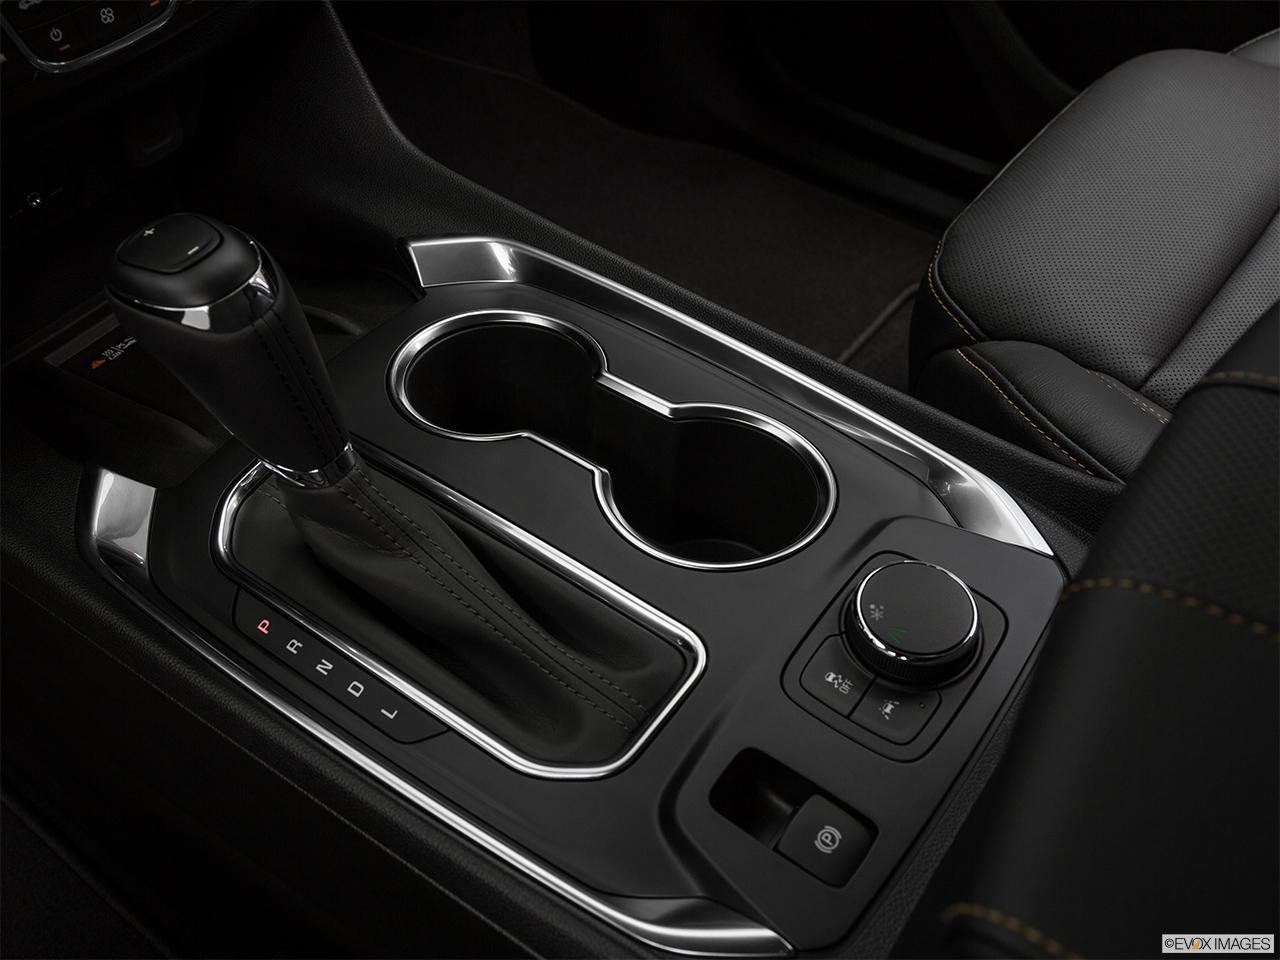 Chevrolet Traverse 2018 3 6l Ltz In Qatar New Car Prices